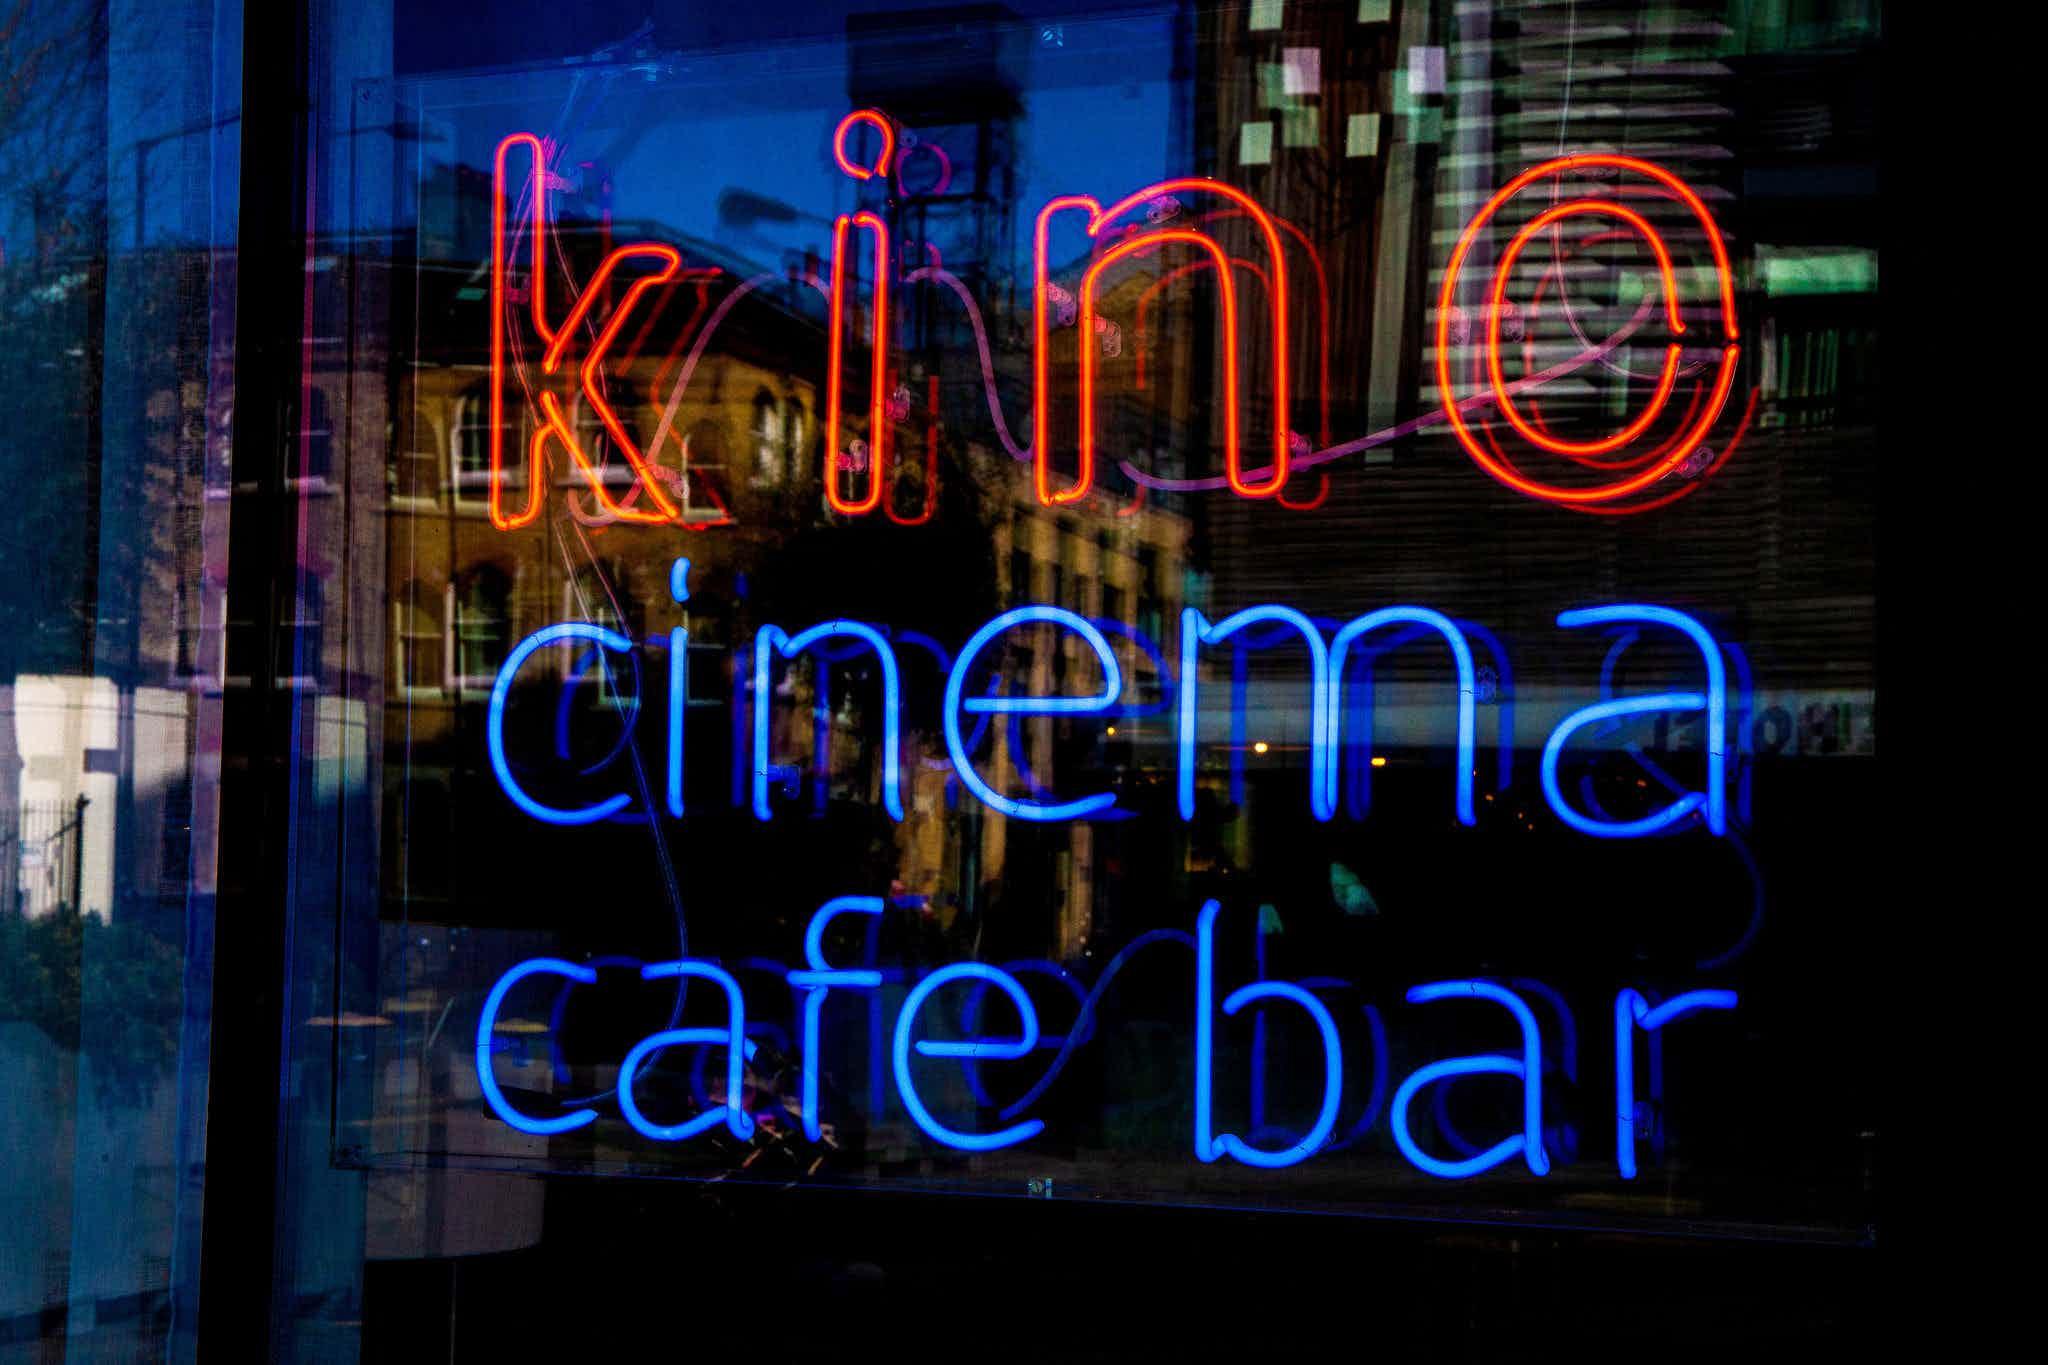 Cinema and Bar, Kino Bermondsey